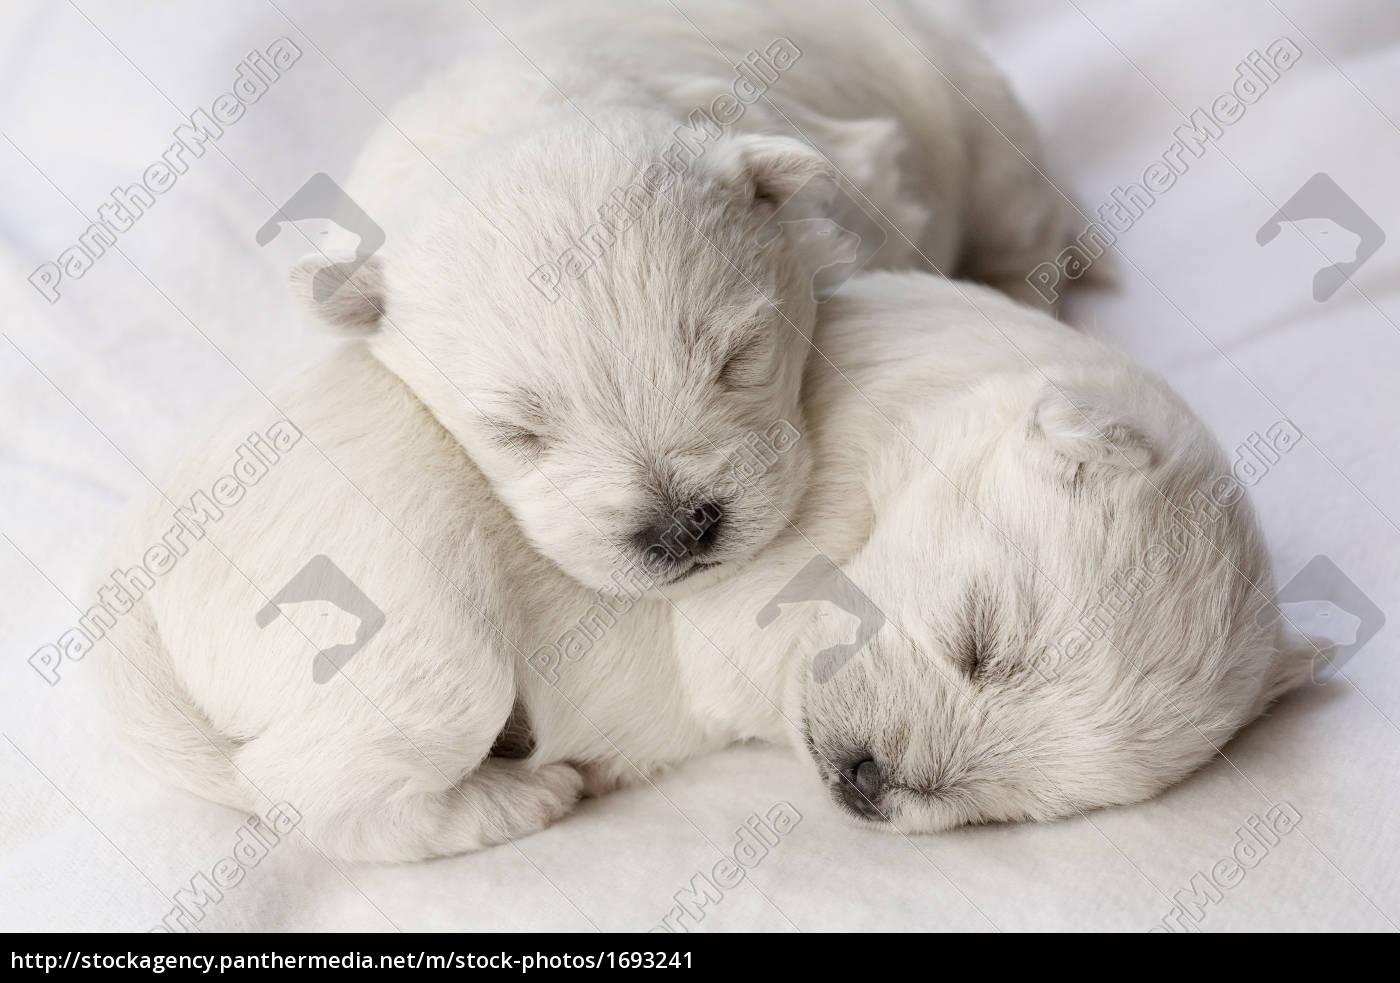 sleeping, puppies - 1693241